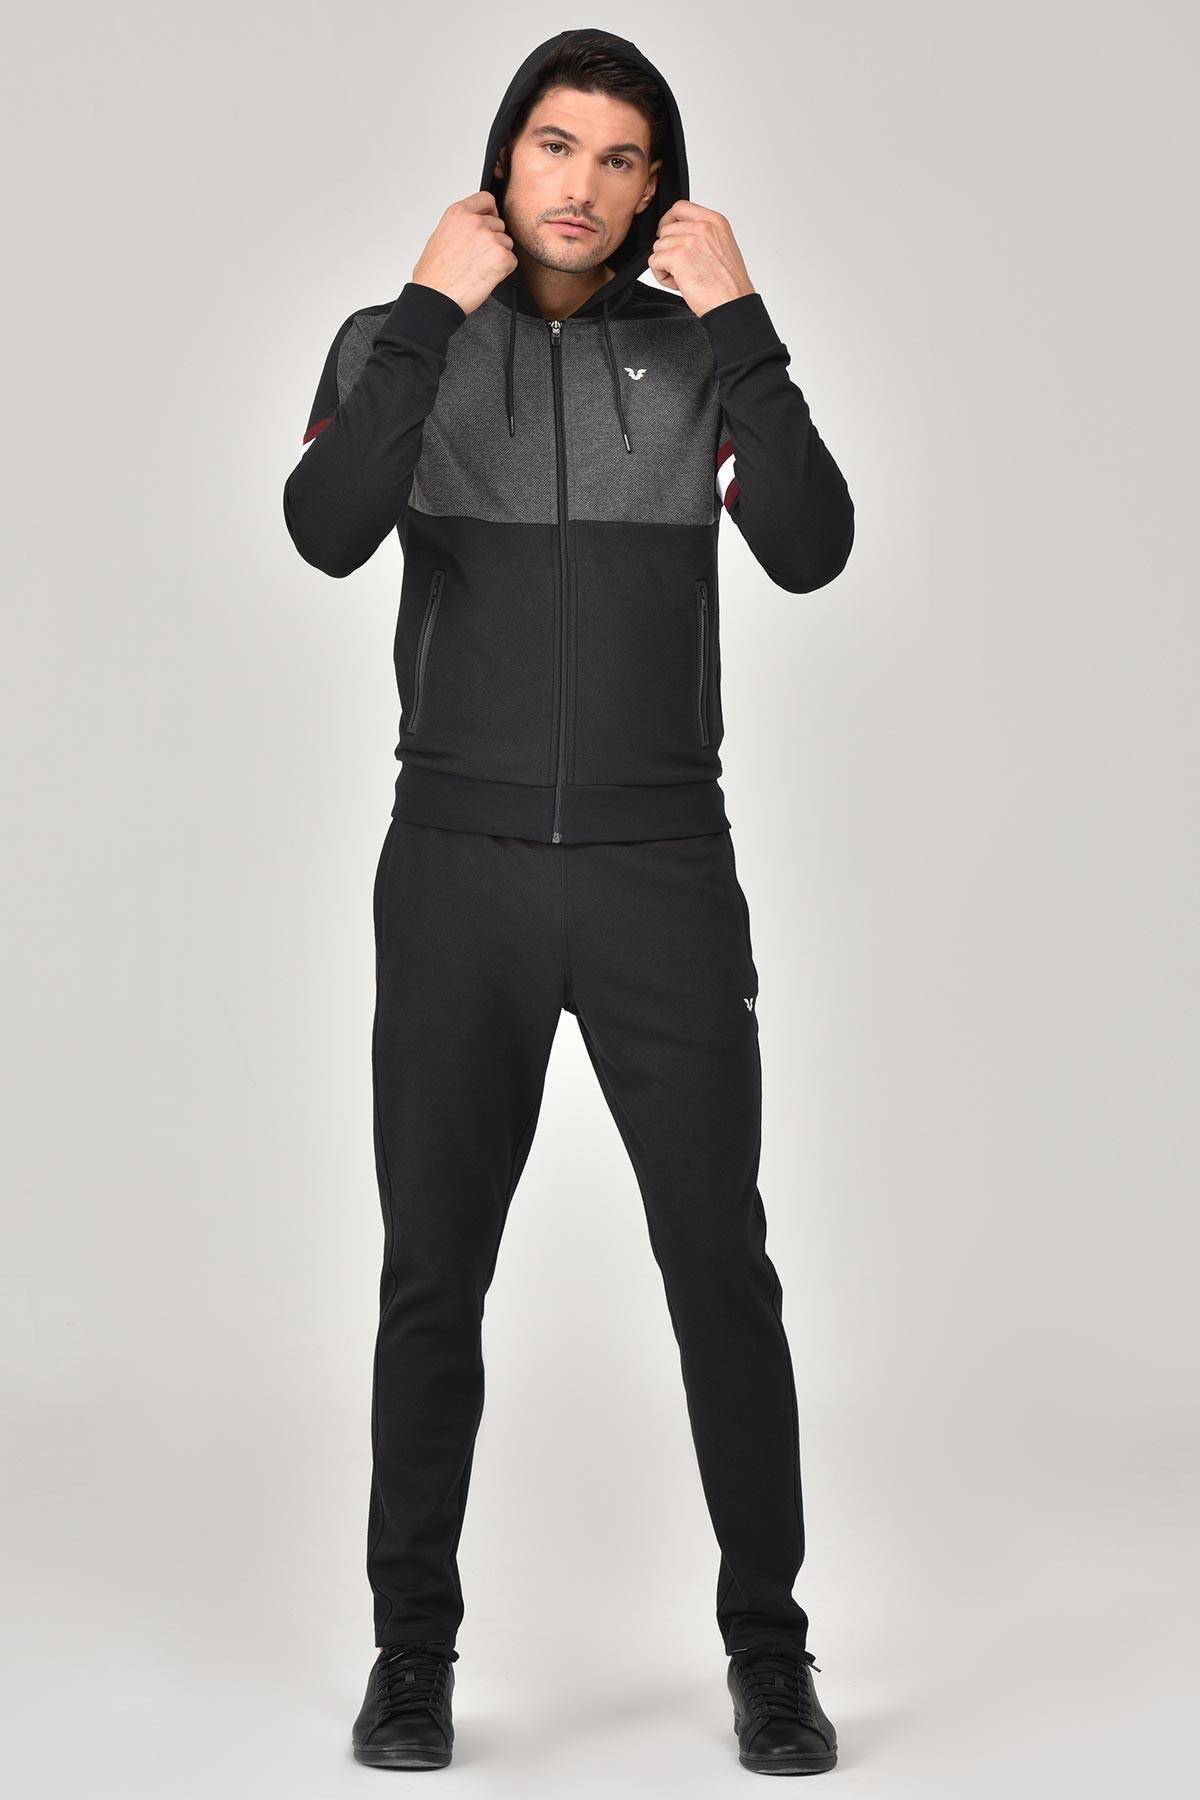 Bilcee Siyah Pamuk/Poly Erkek Eşofman Takımı FW-1245 BİLCEE